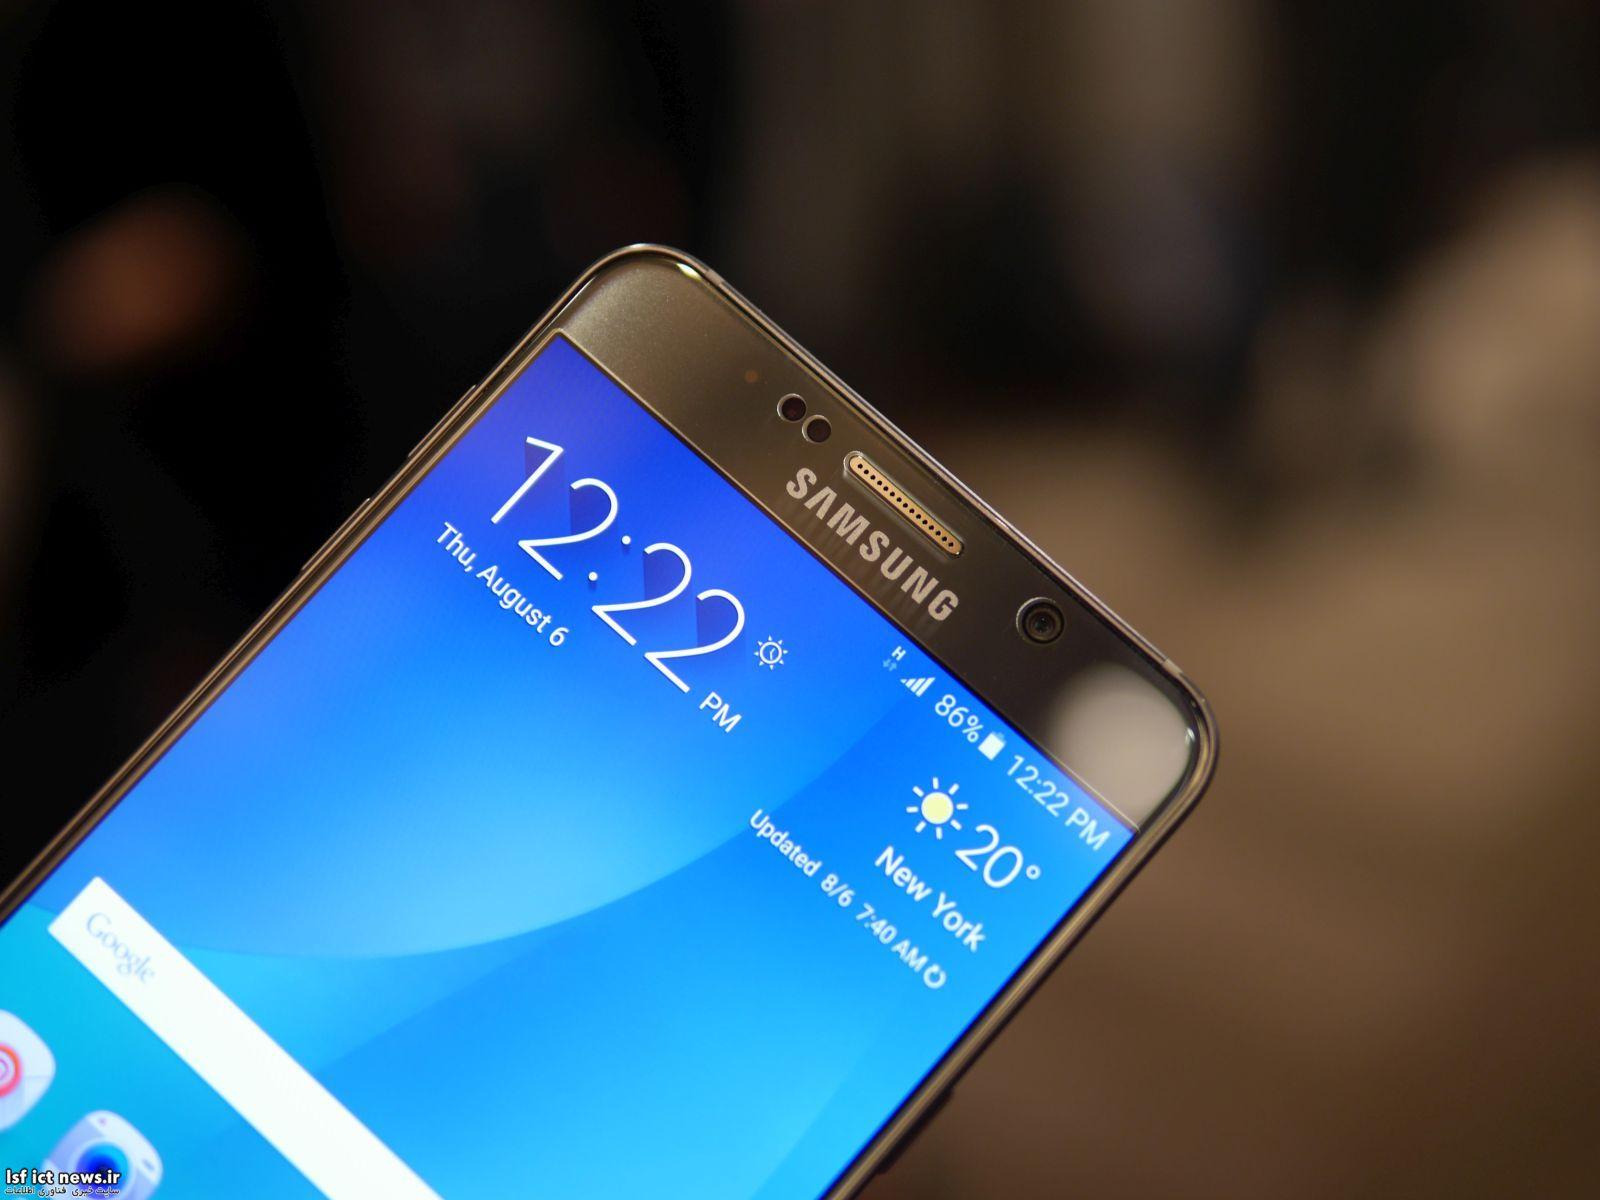 Samsung-Galaxy-Note5 (1)